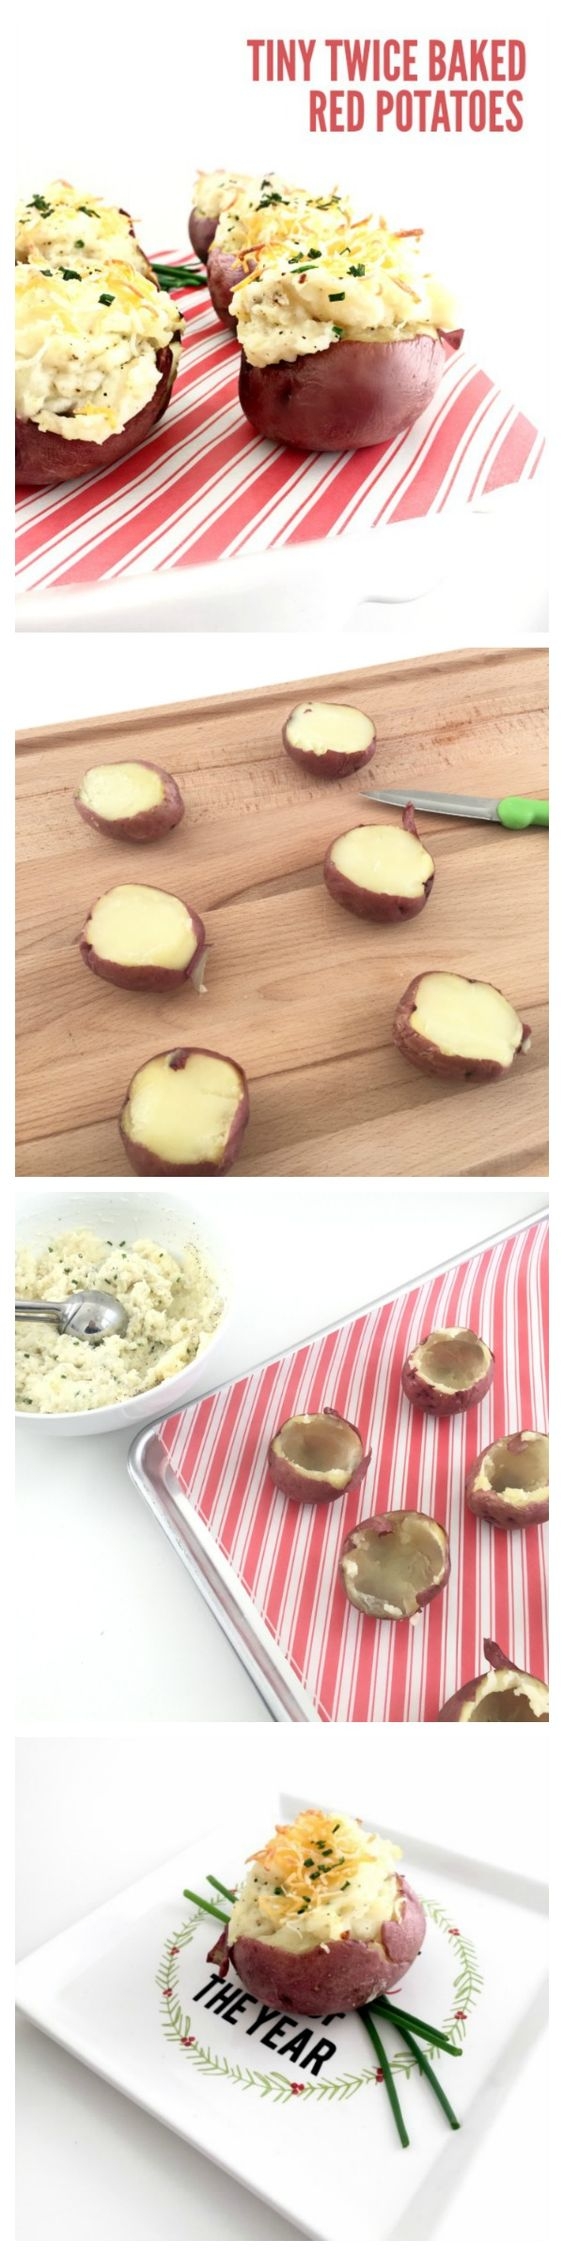 Fancy red potato recipes